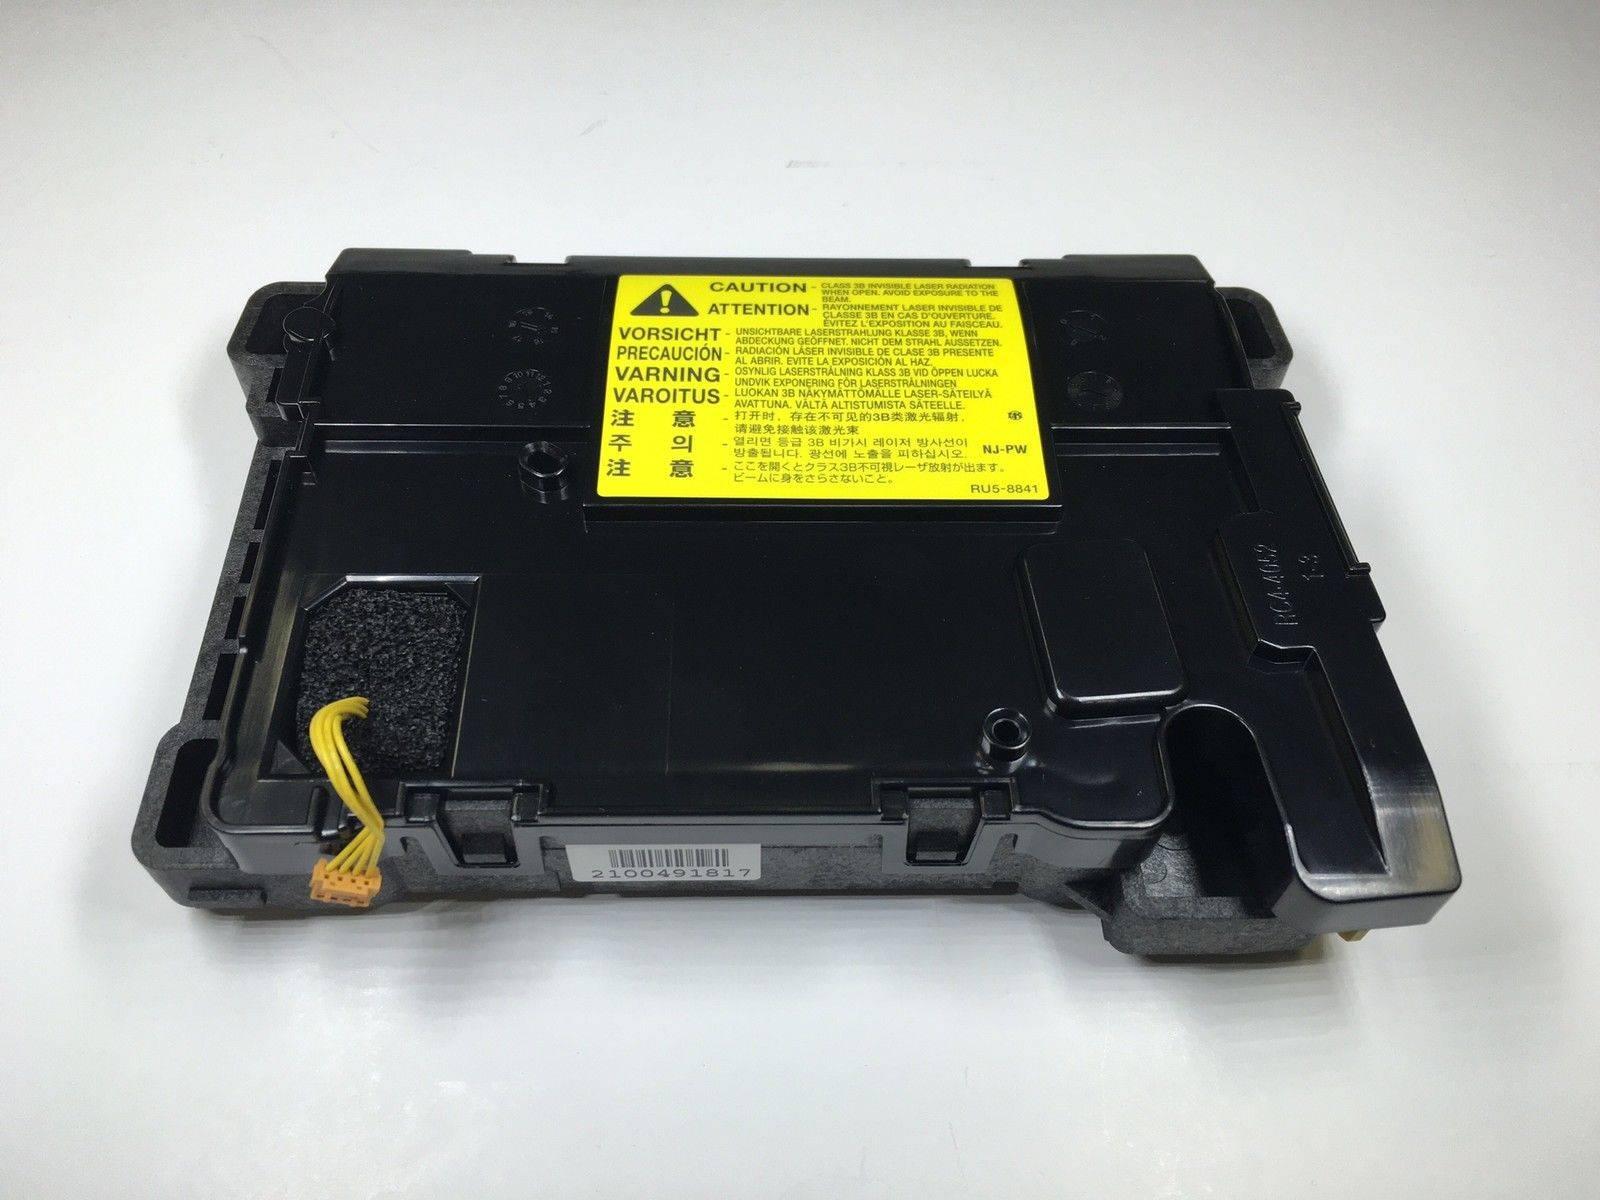 Фото Блок лазера HP LJ M402, M426, M501, M506, M526 (RM2-5528, RM2-5525, RM2-5529)